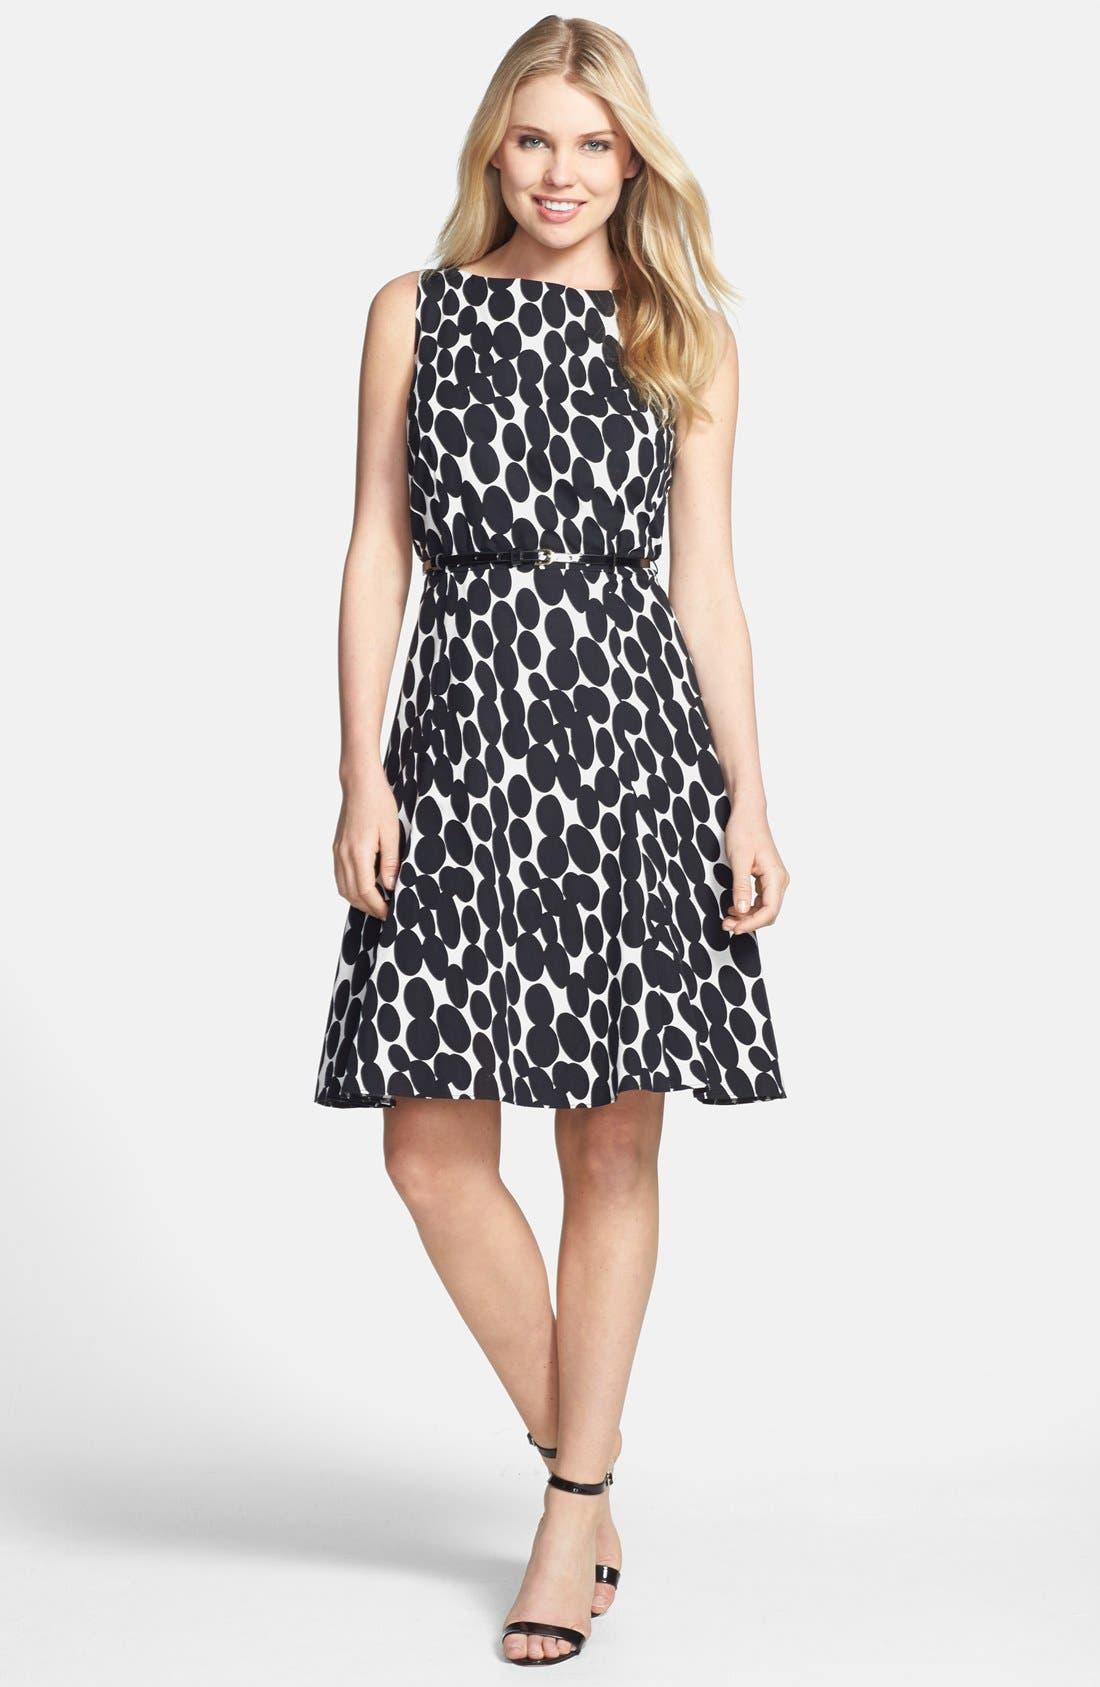 Main Image - Wallis 'Oval Spots' Fit & Flare Dress